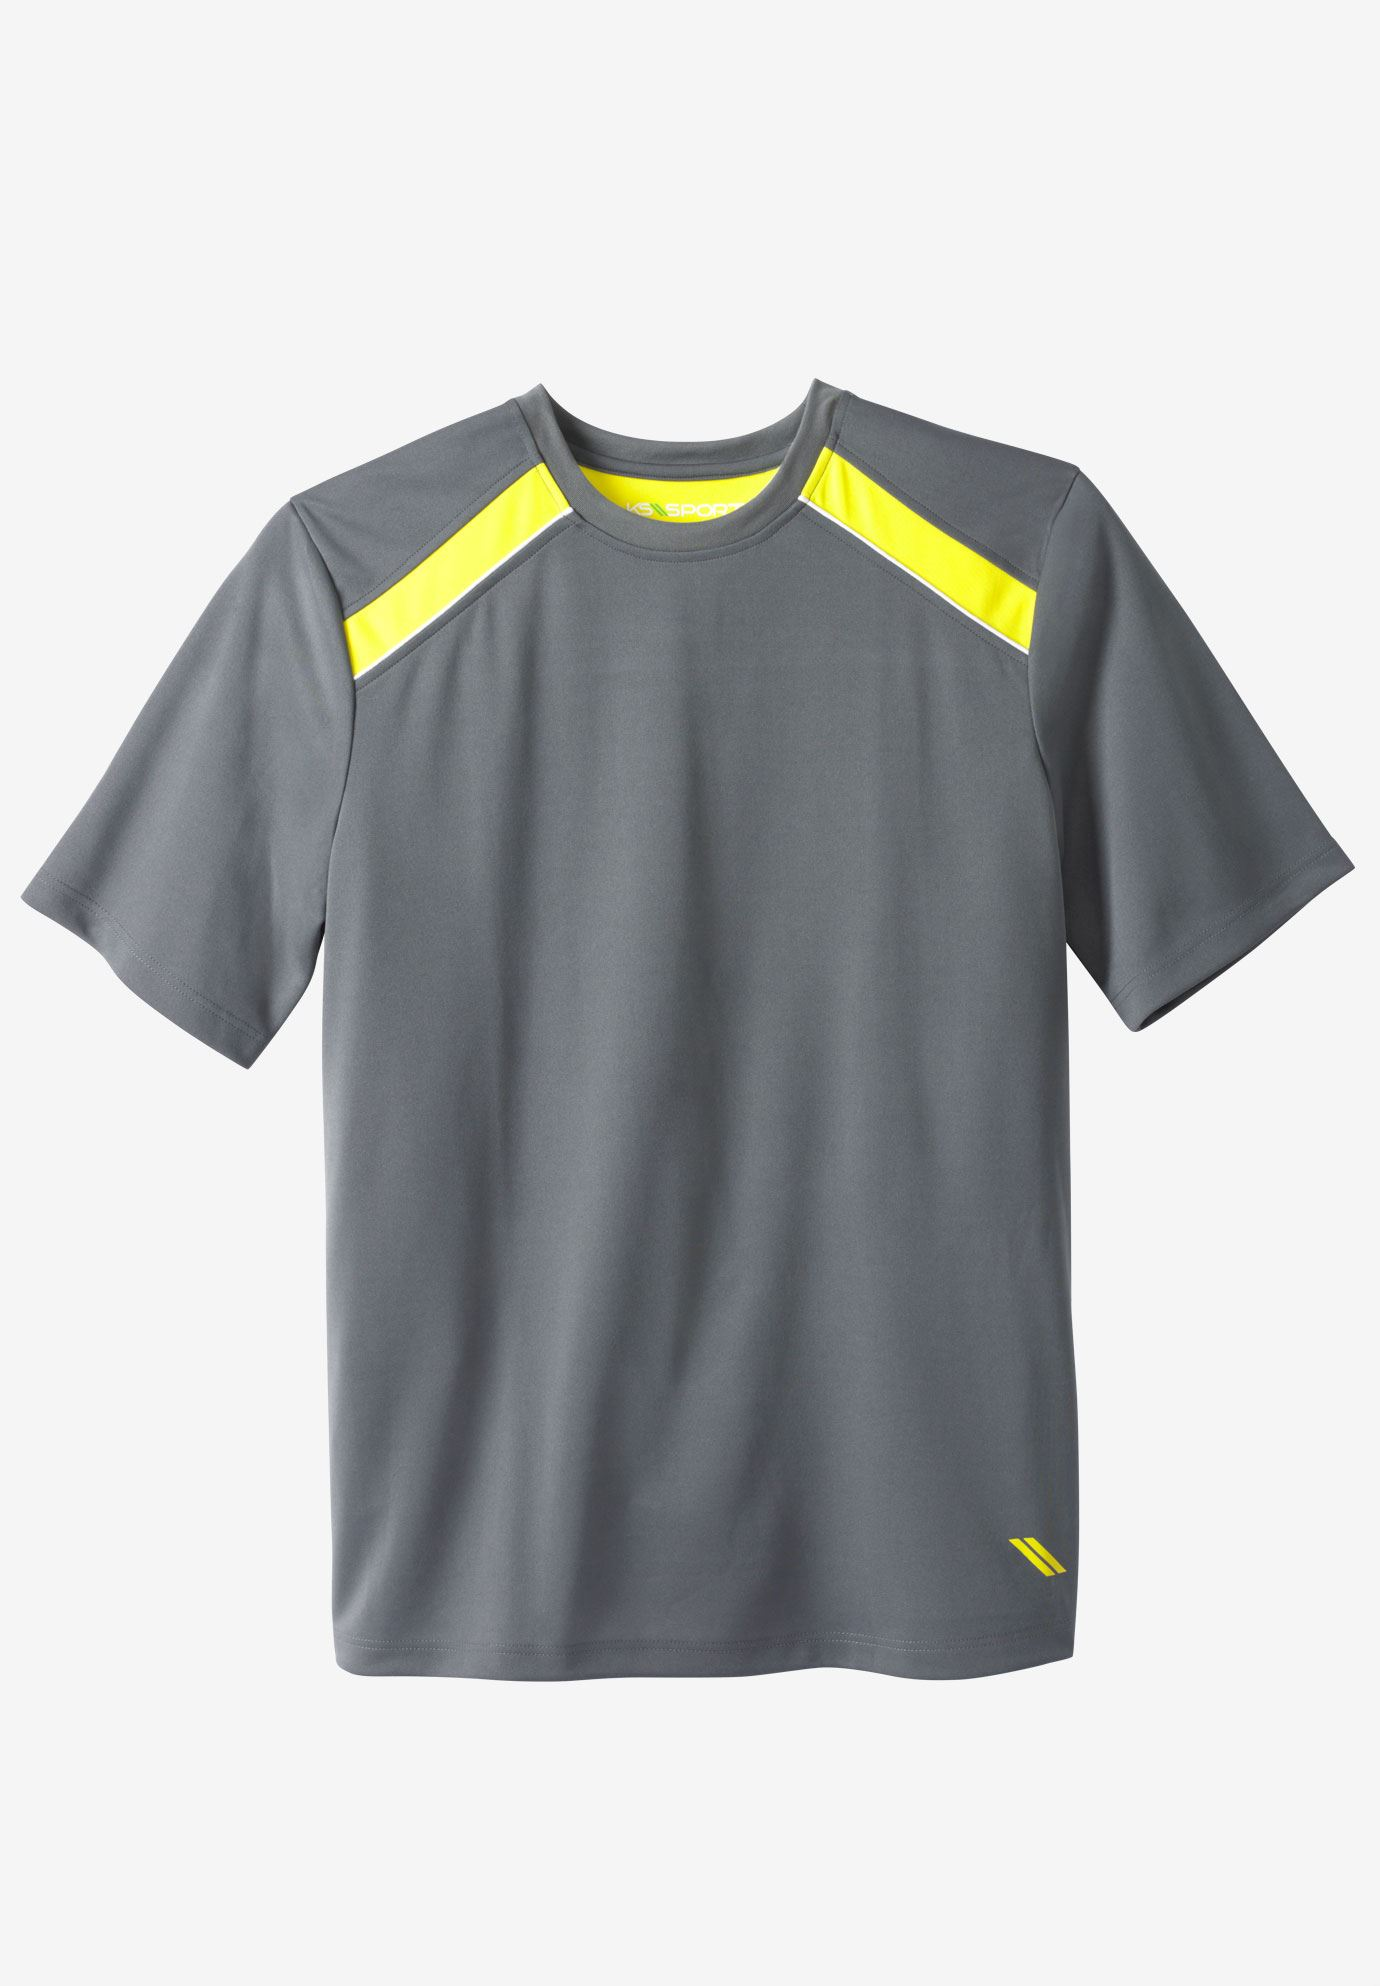 87b3eb511a9 Power Wicking Short Sleeve Tee by KS Sport™